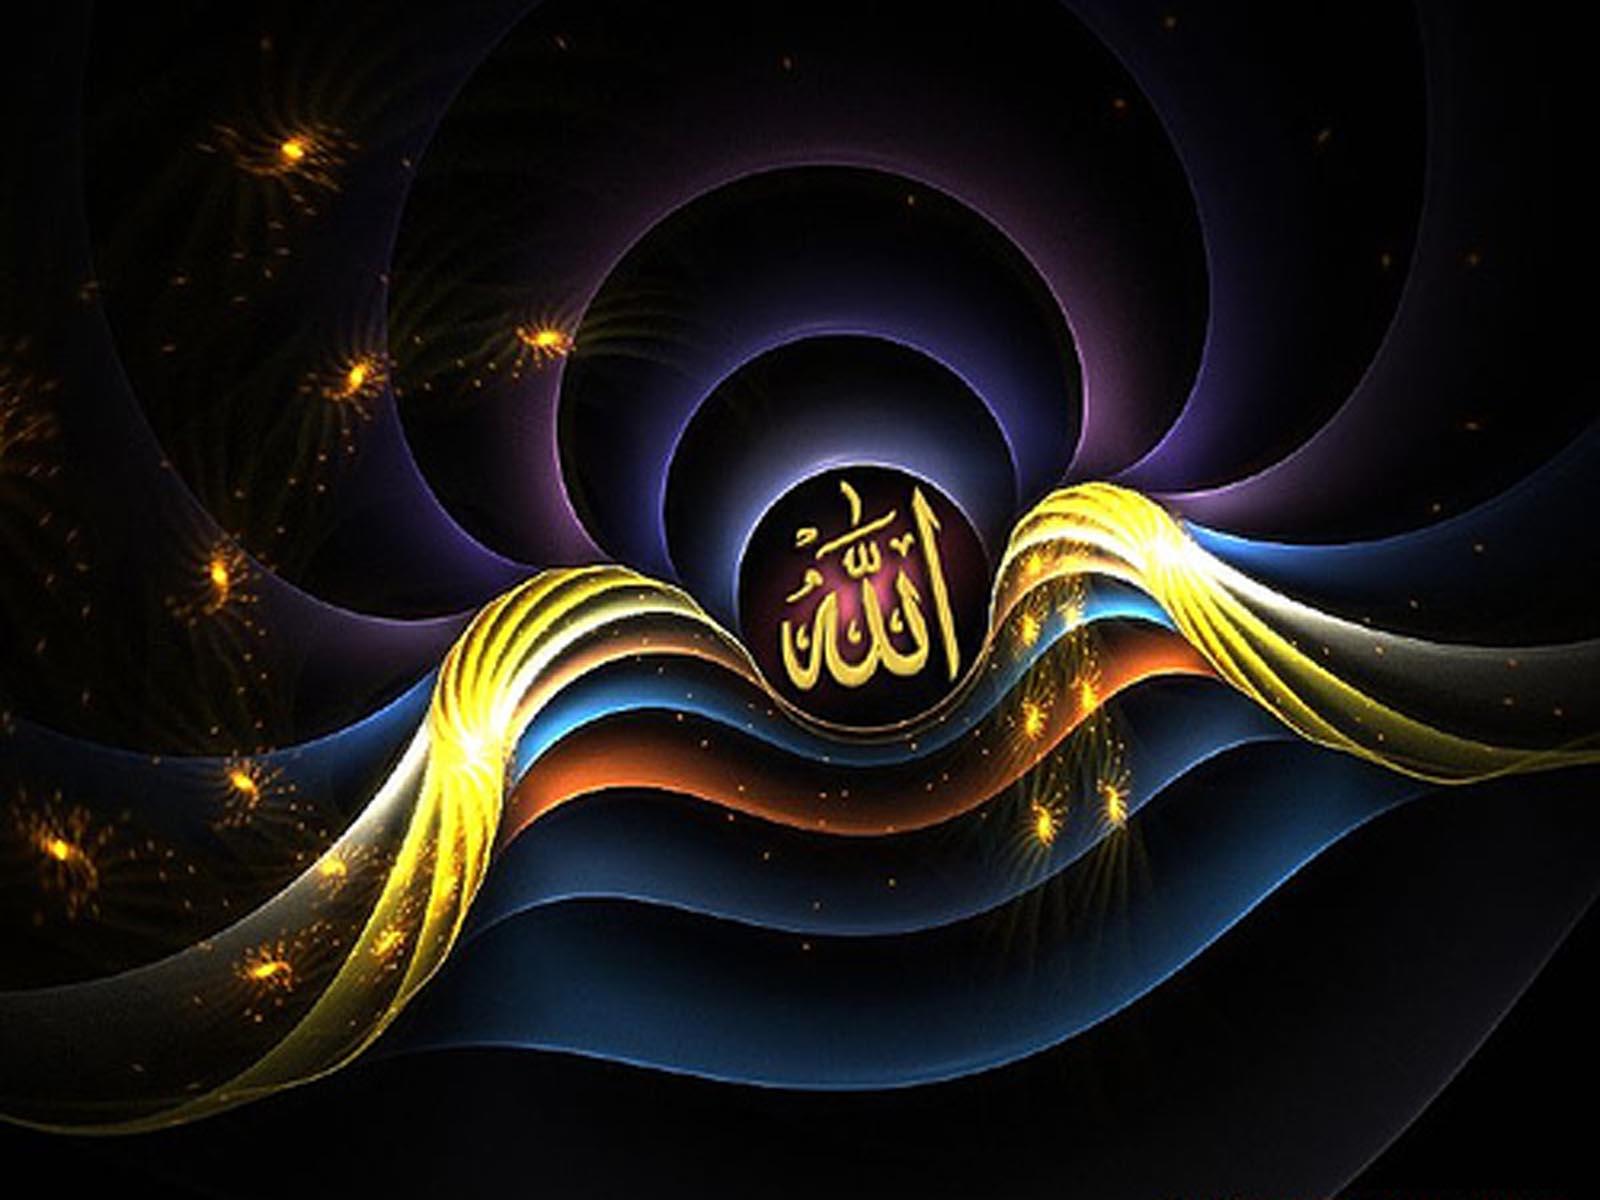 Wallpaper 4 Allah Name 5 6 1600x1200